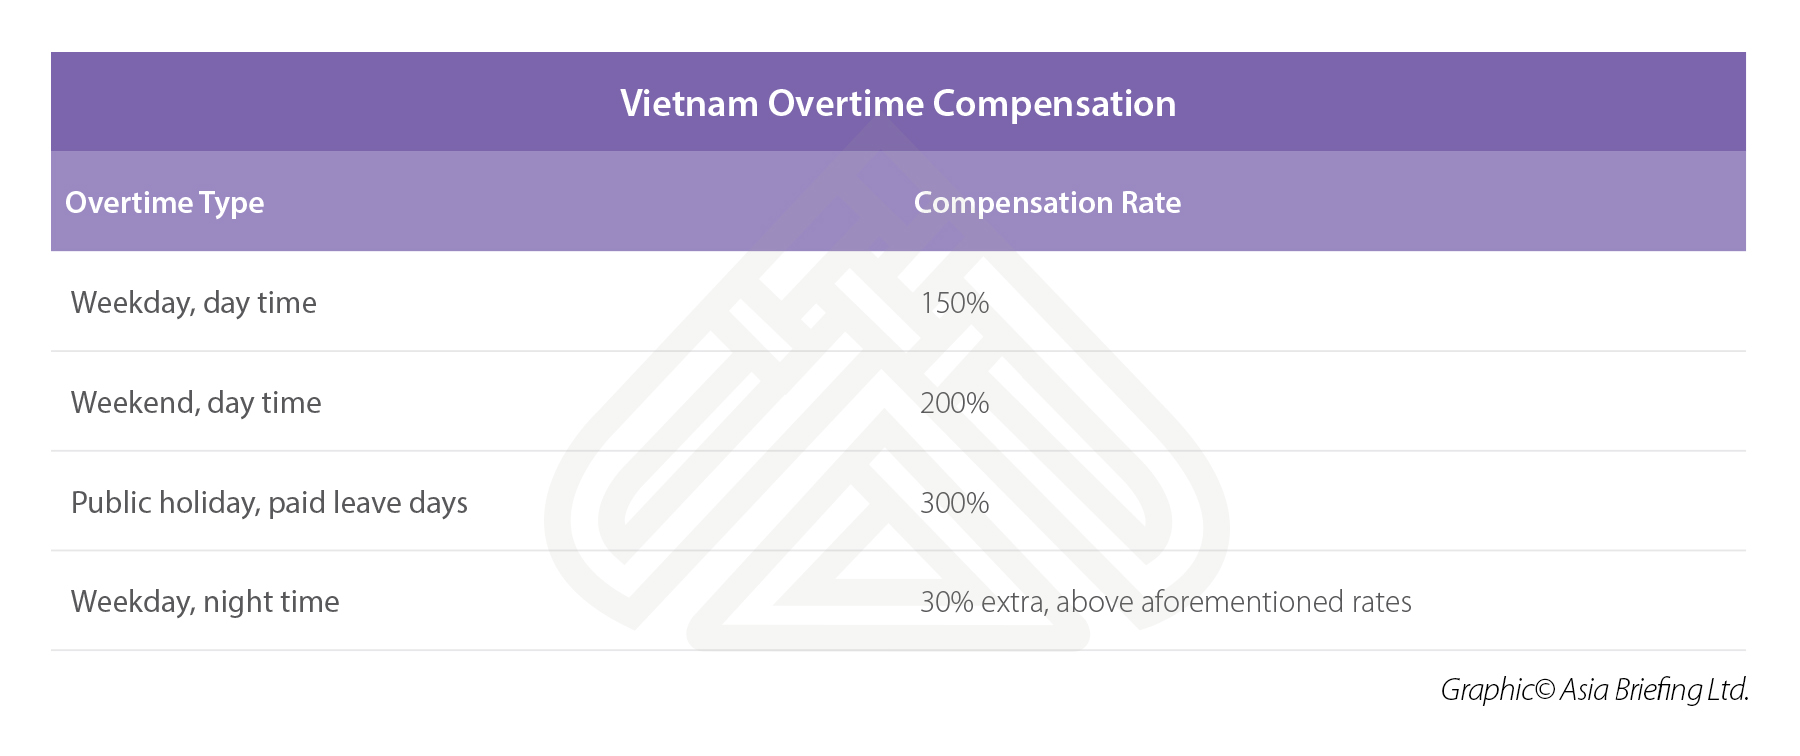 Infographic: Vietnam Overtime Compensation